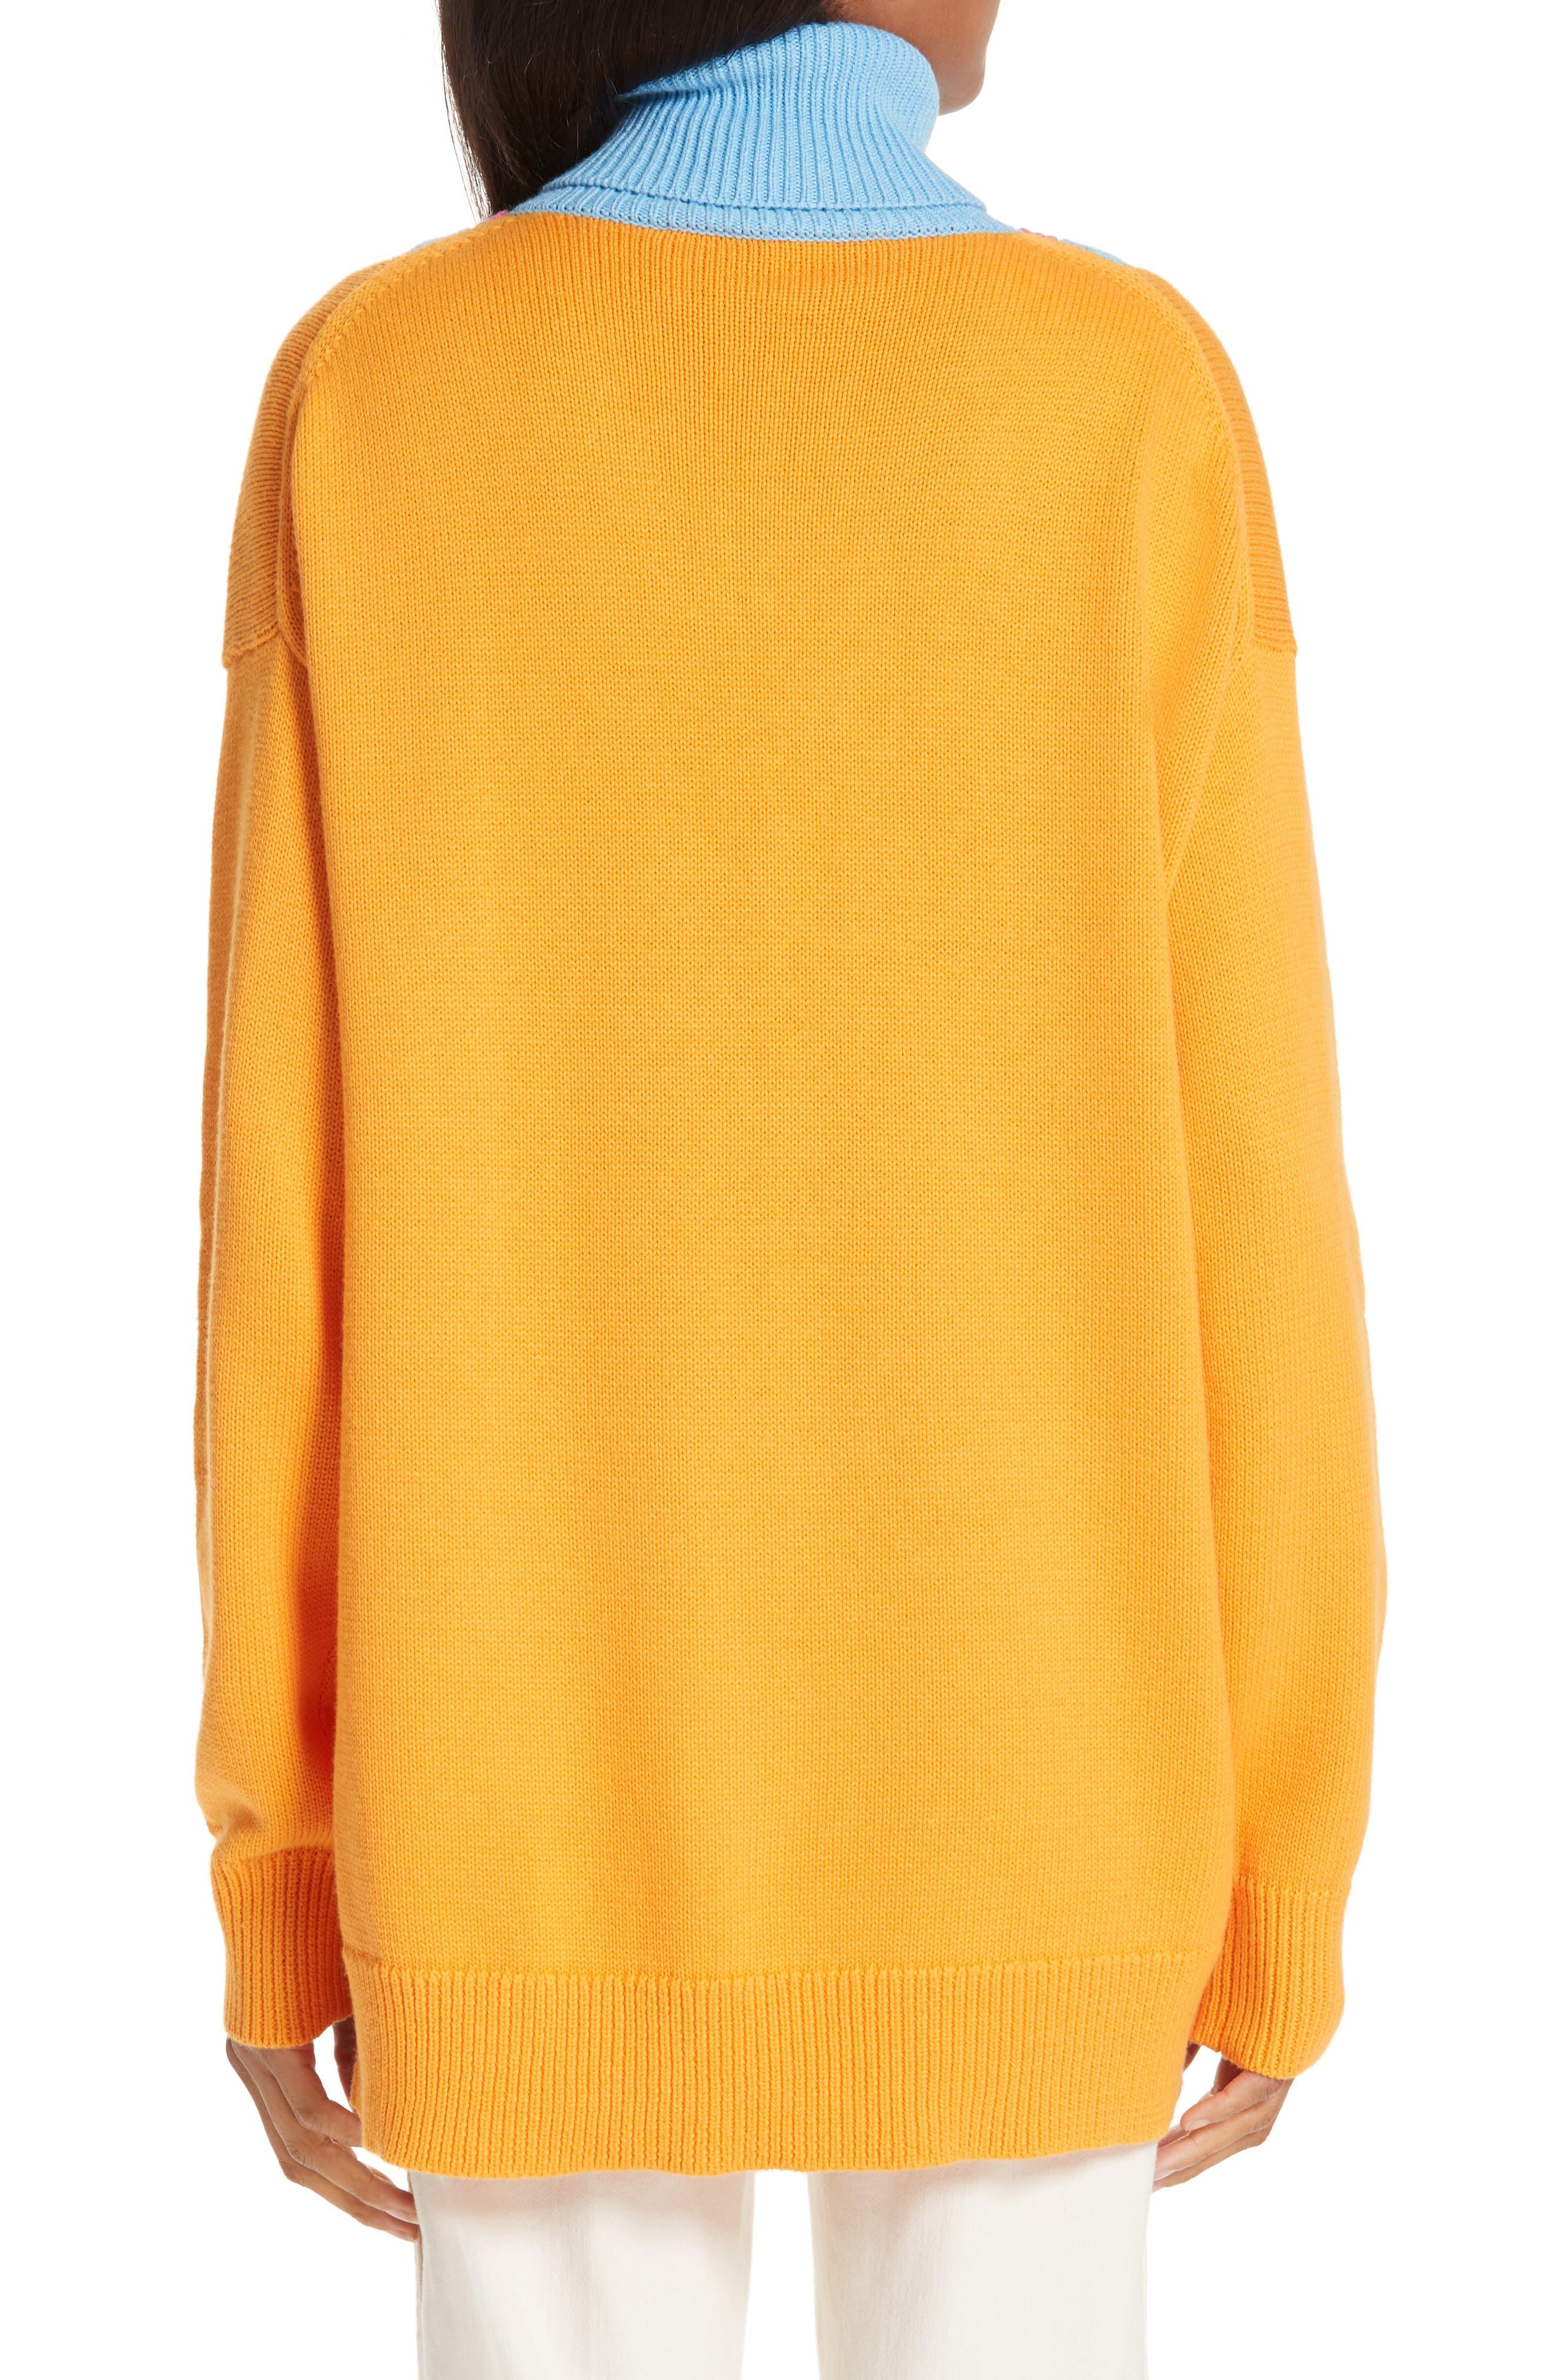 VICTOR GLEMAUD,                             Layered Cotton & Cashmere Turtleneck Sweater,                             Alternate thumbnail 2, color,                             ORANGE COMBO